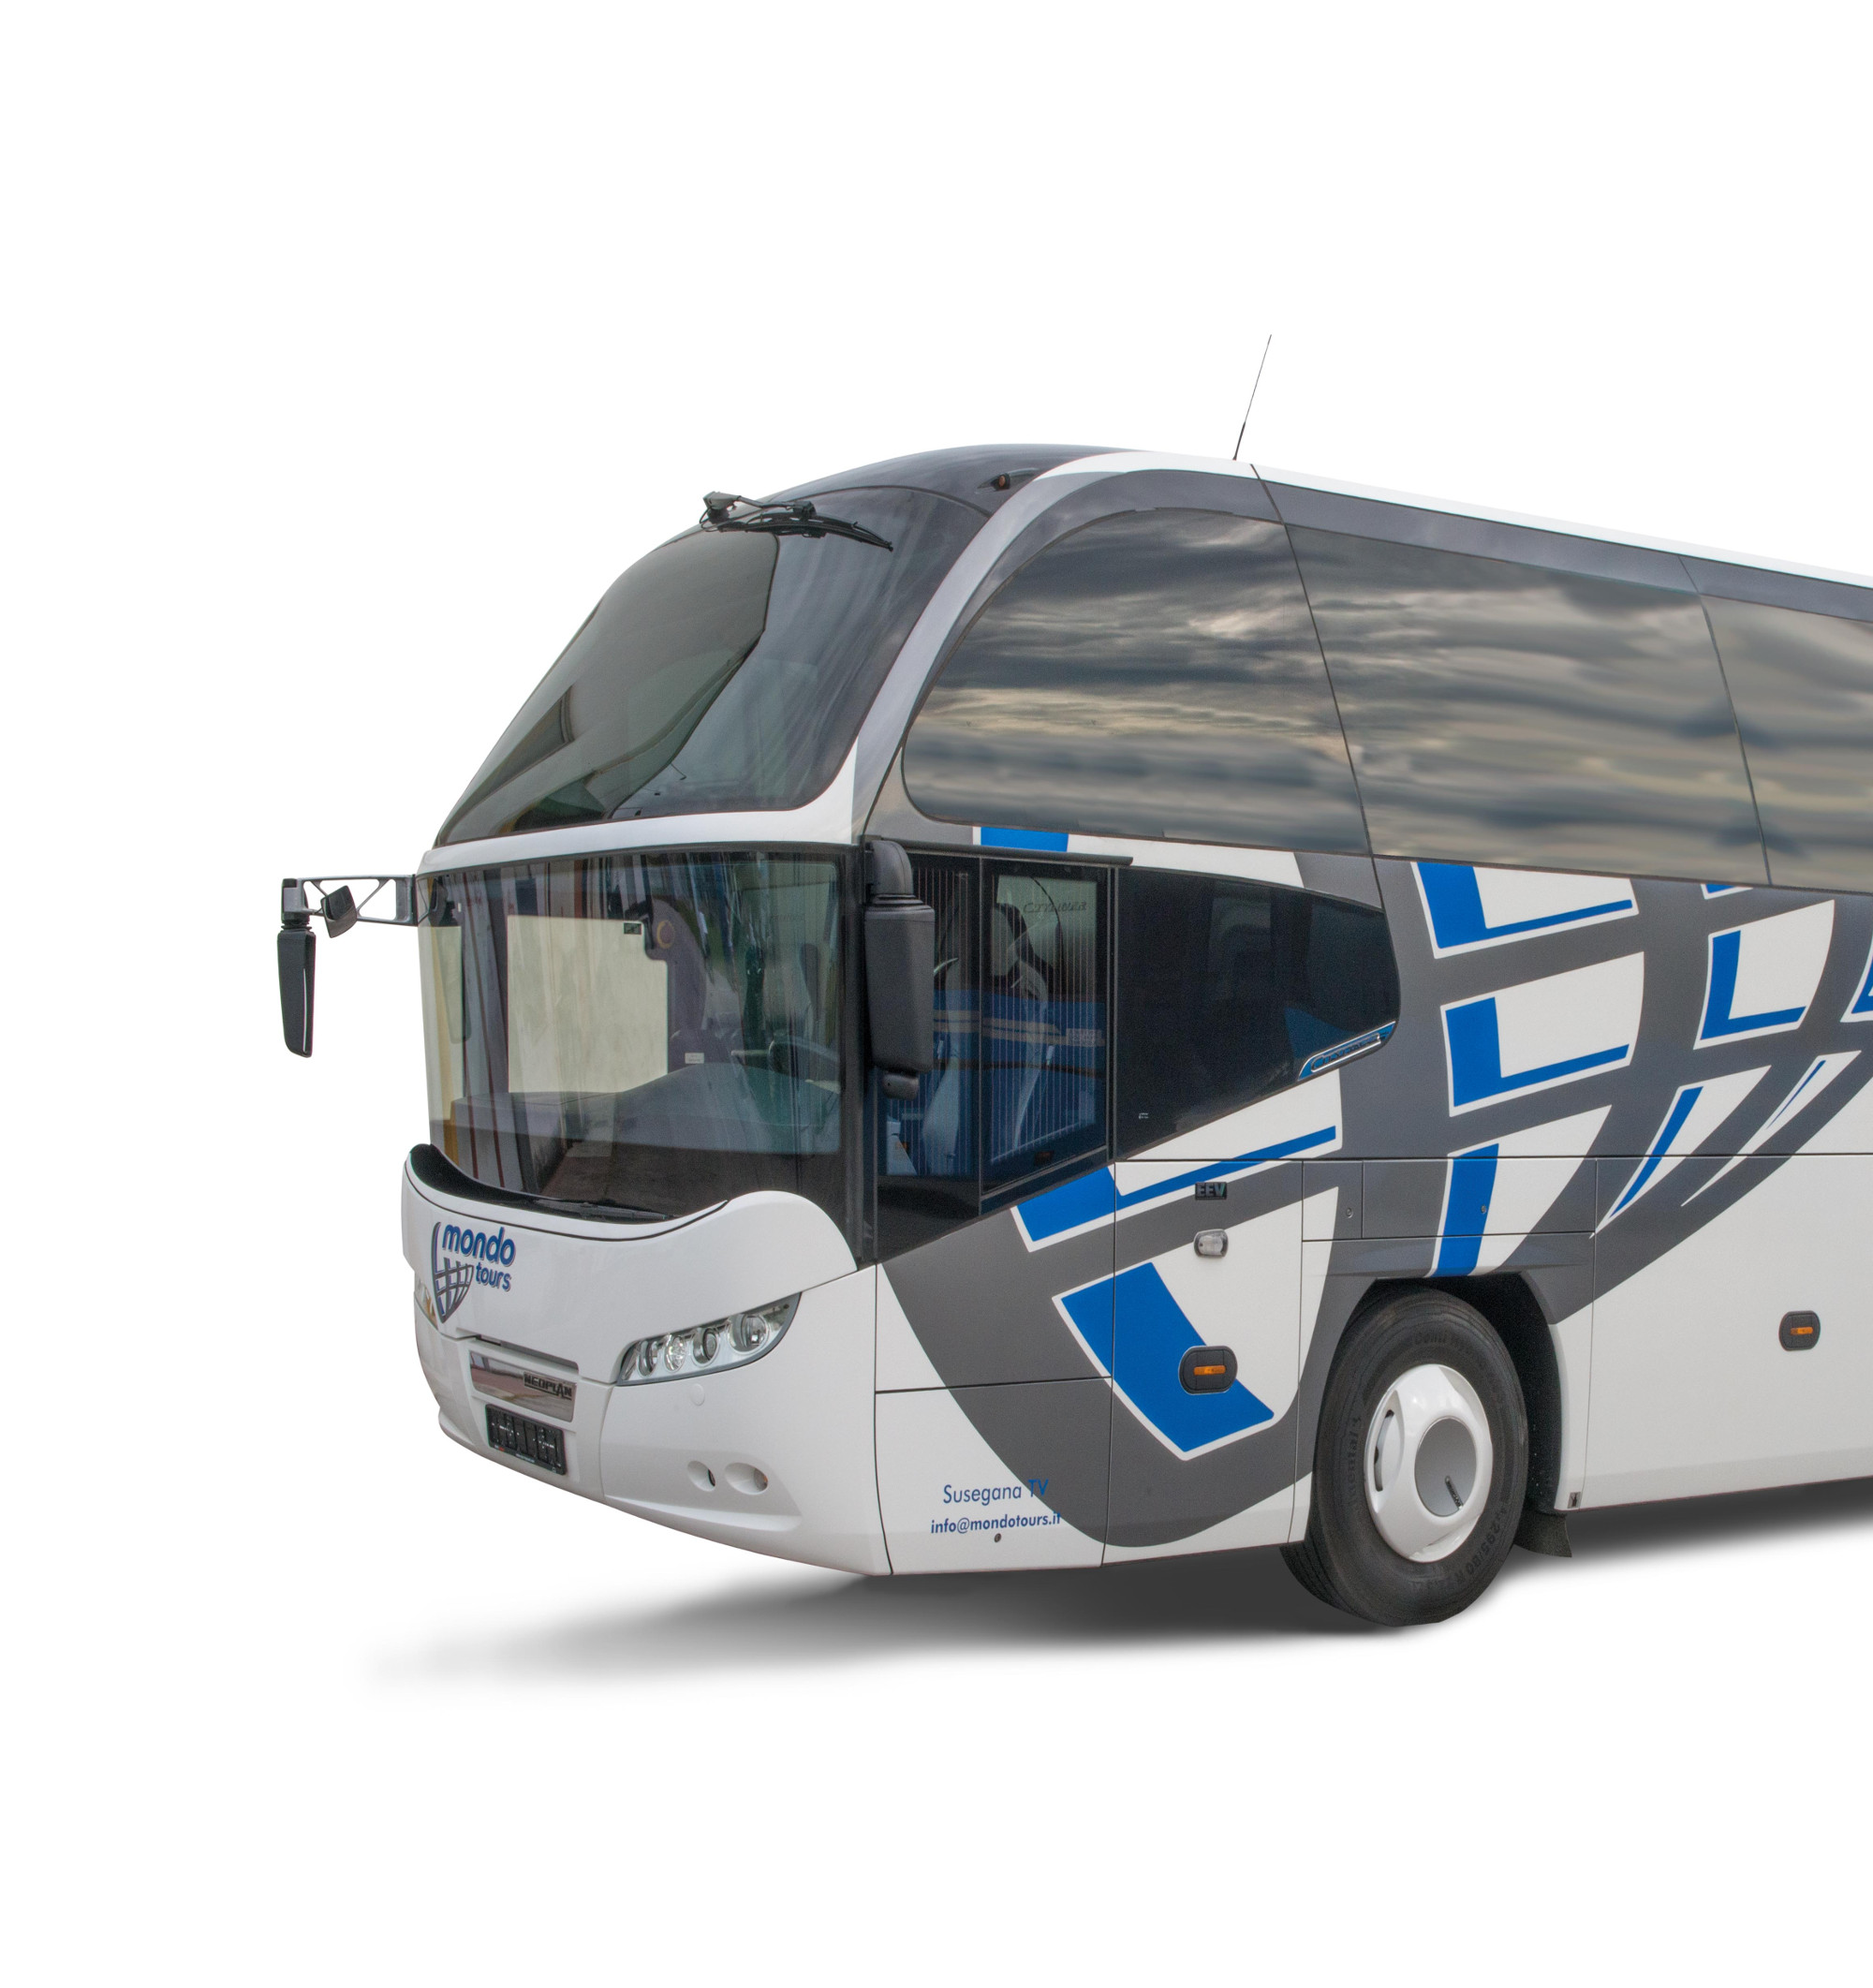 mondotours-pullman-granturismo-neoplan-cityliner-01-555-370-c-90.jpg